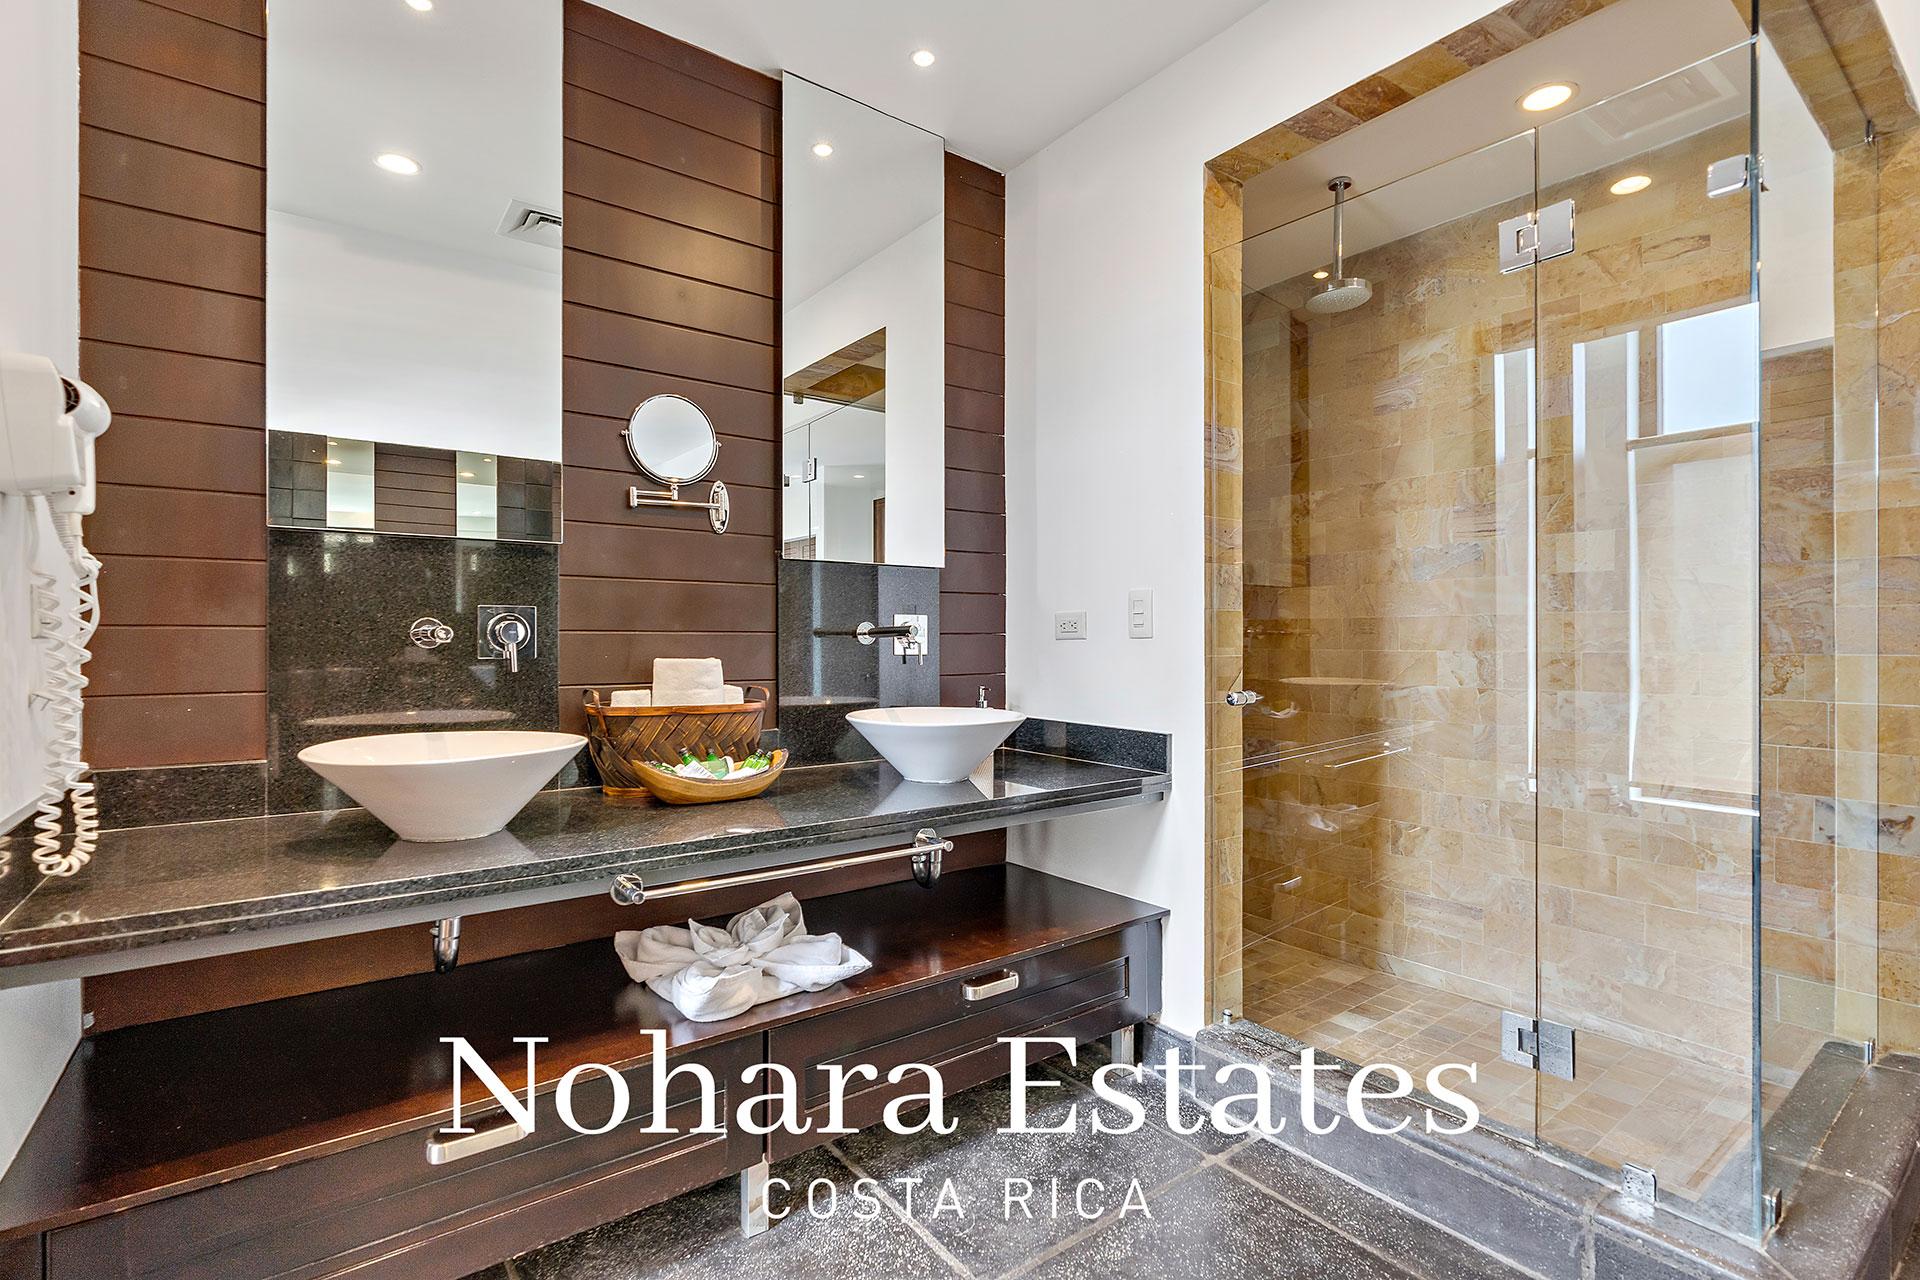 Nohara Estates Costa Rica 128 Penthouse Quepos Los Altos 13